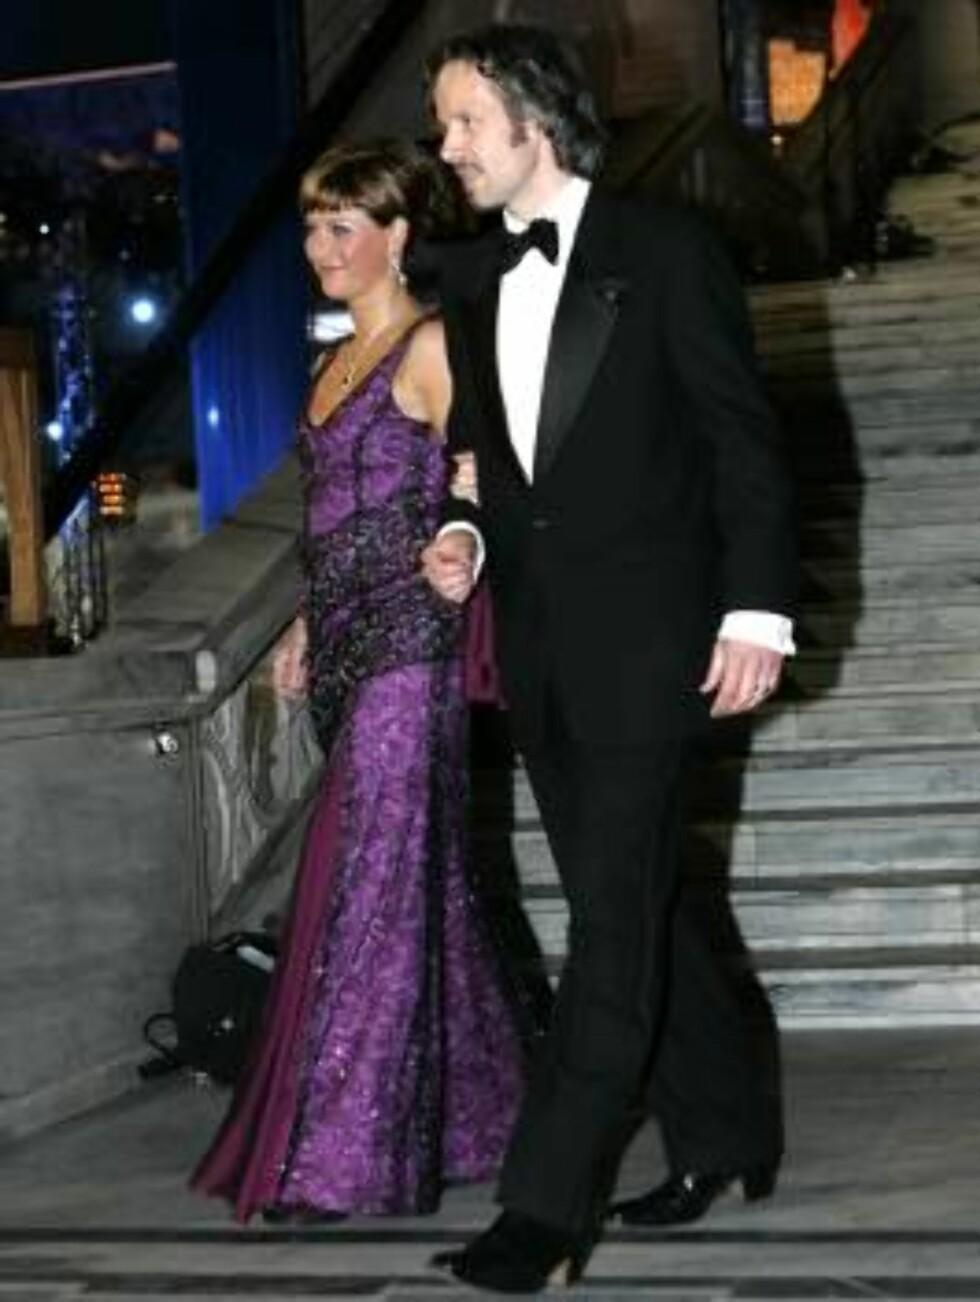 OSLO 20070223: Prinsesse Märtha Louise og Ari Behn ankommer festforestillingen i Oslo rådhus fredag kveld. Foto: Bjørn Sigurdsøn / SCANPIX / POOL        Foto: SCANPIX